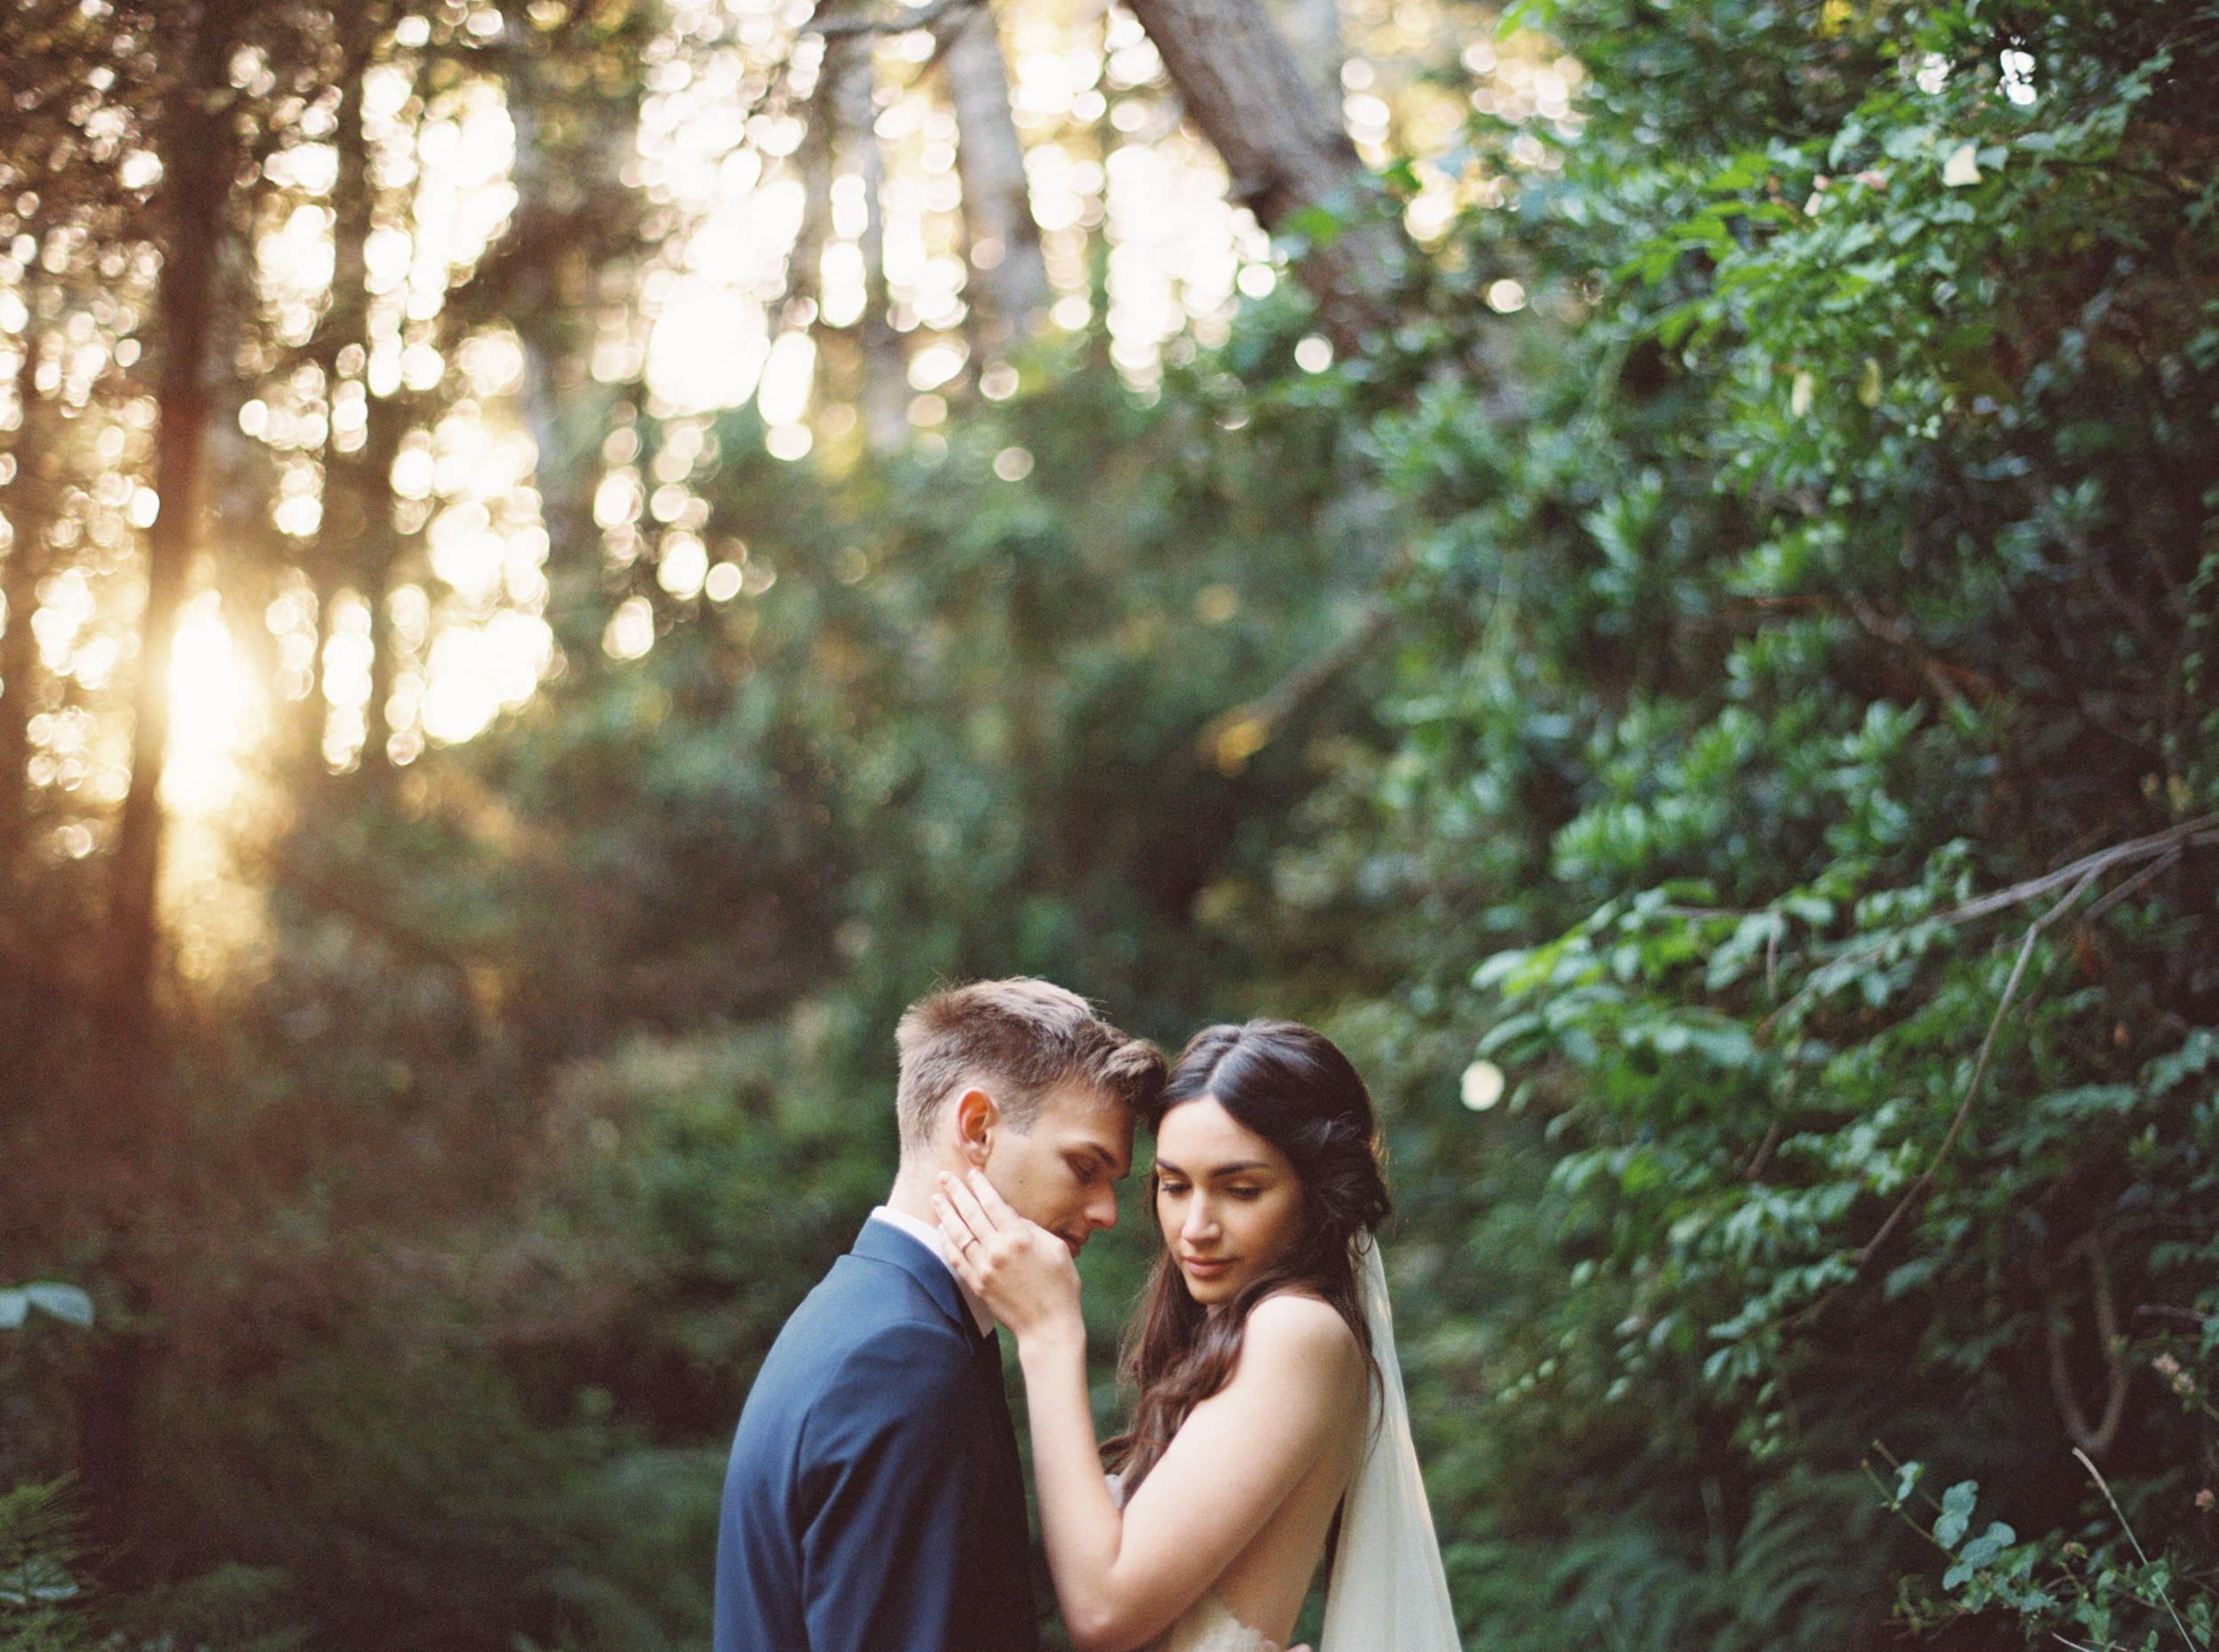 Banff-wedding-photographer-1-7.jpg